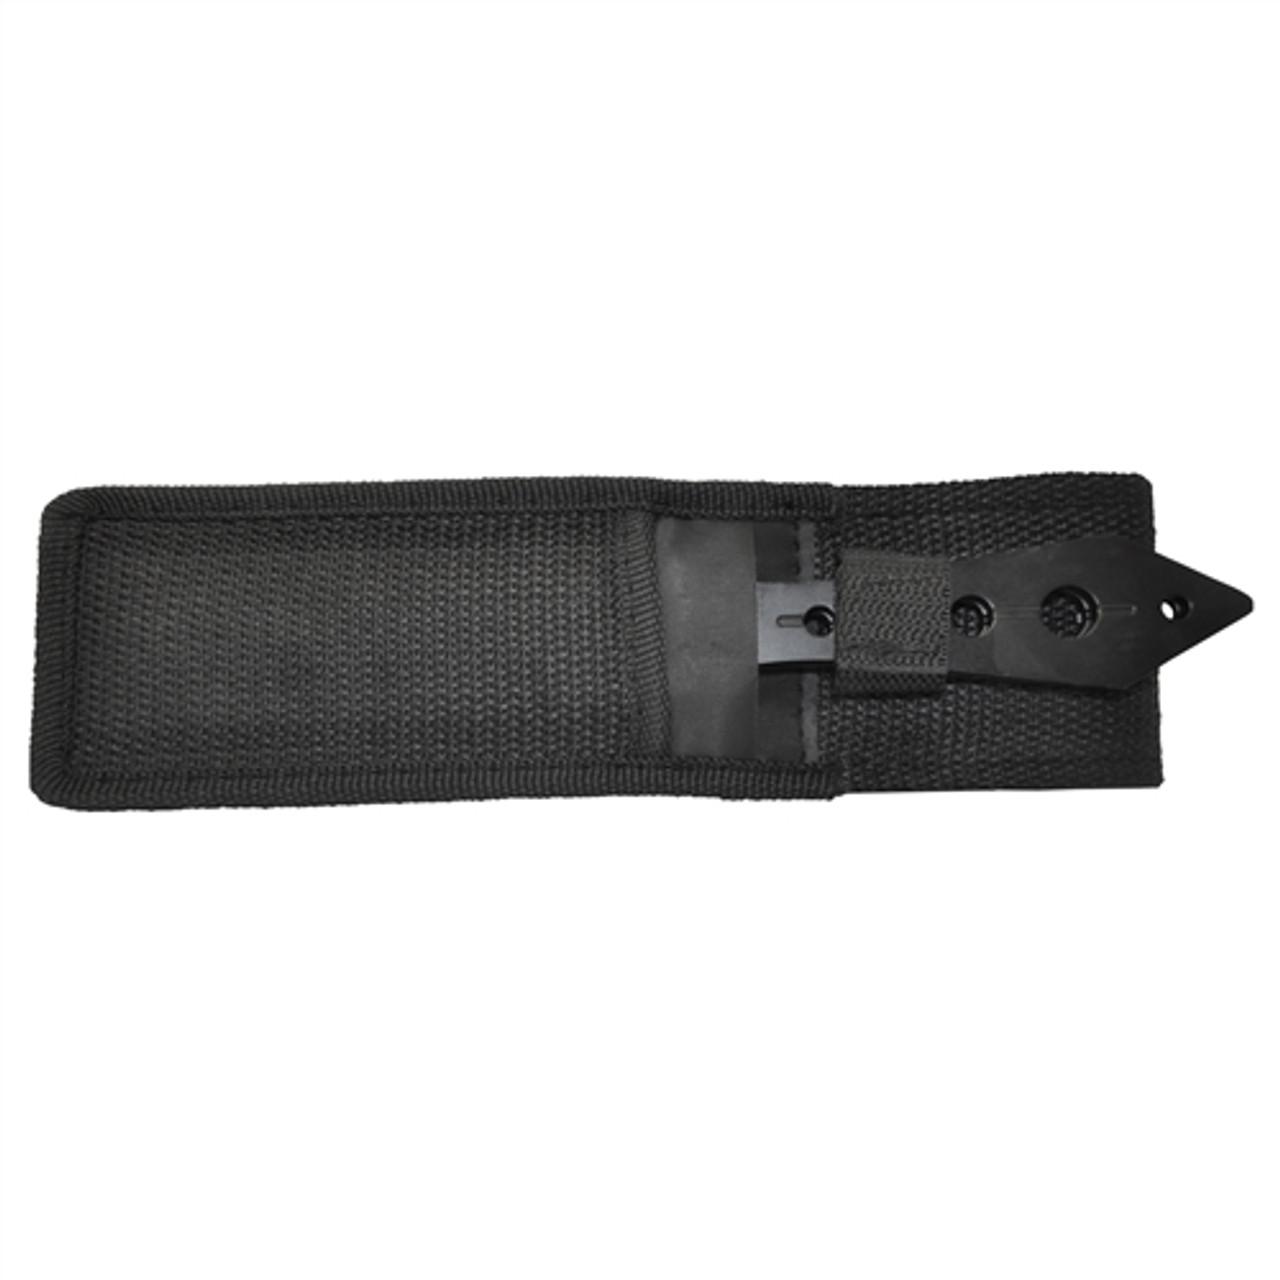 UZI TRW-TZP 2-Piece Throwing Knife Set, Satin/Black Blades